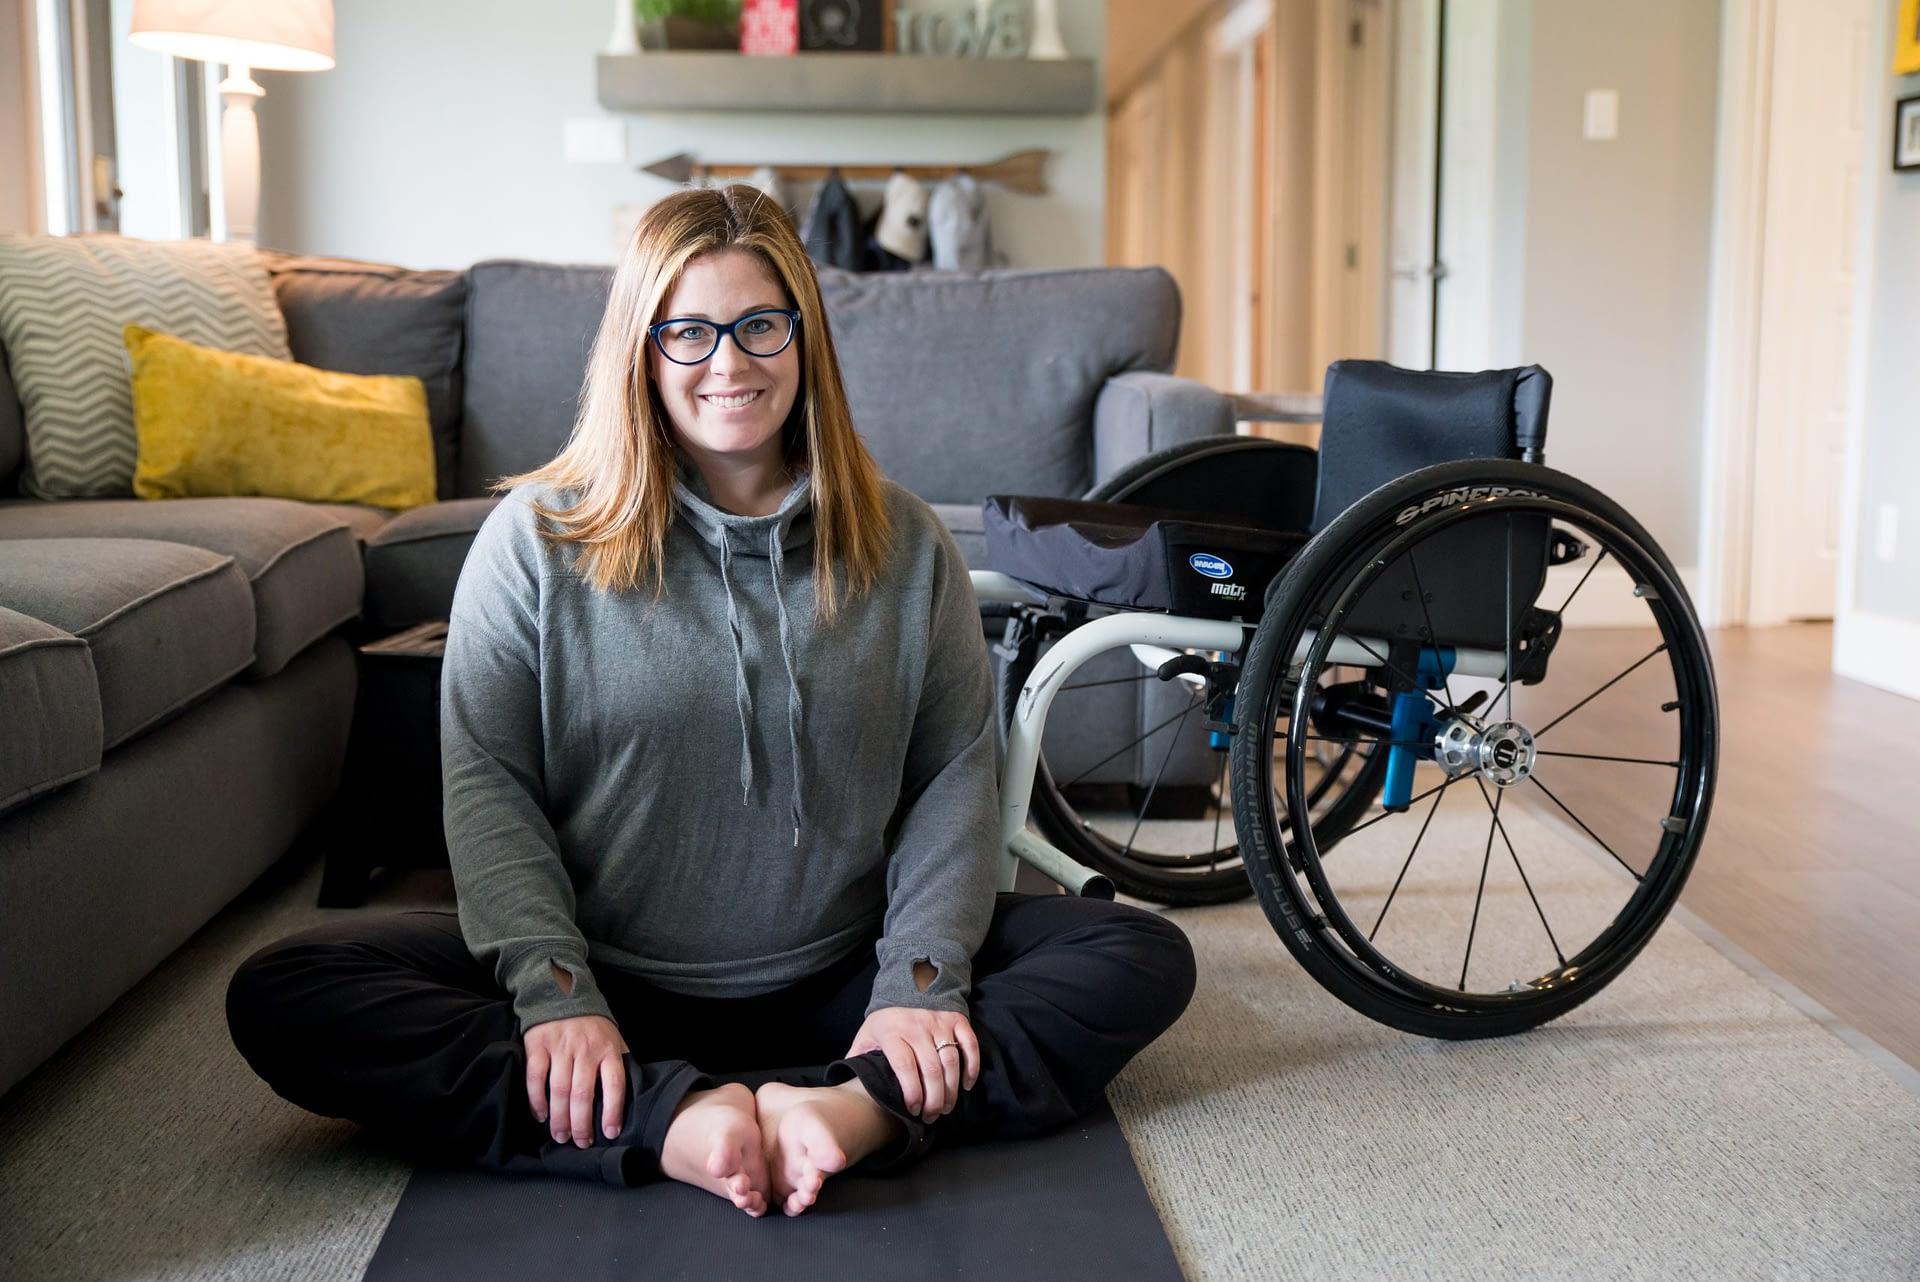 Nurse gives handjob to man in wheelchair